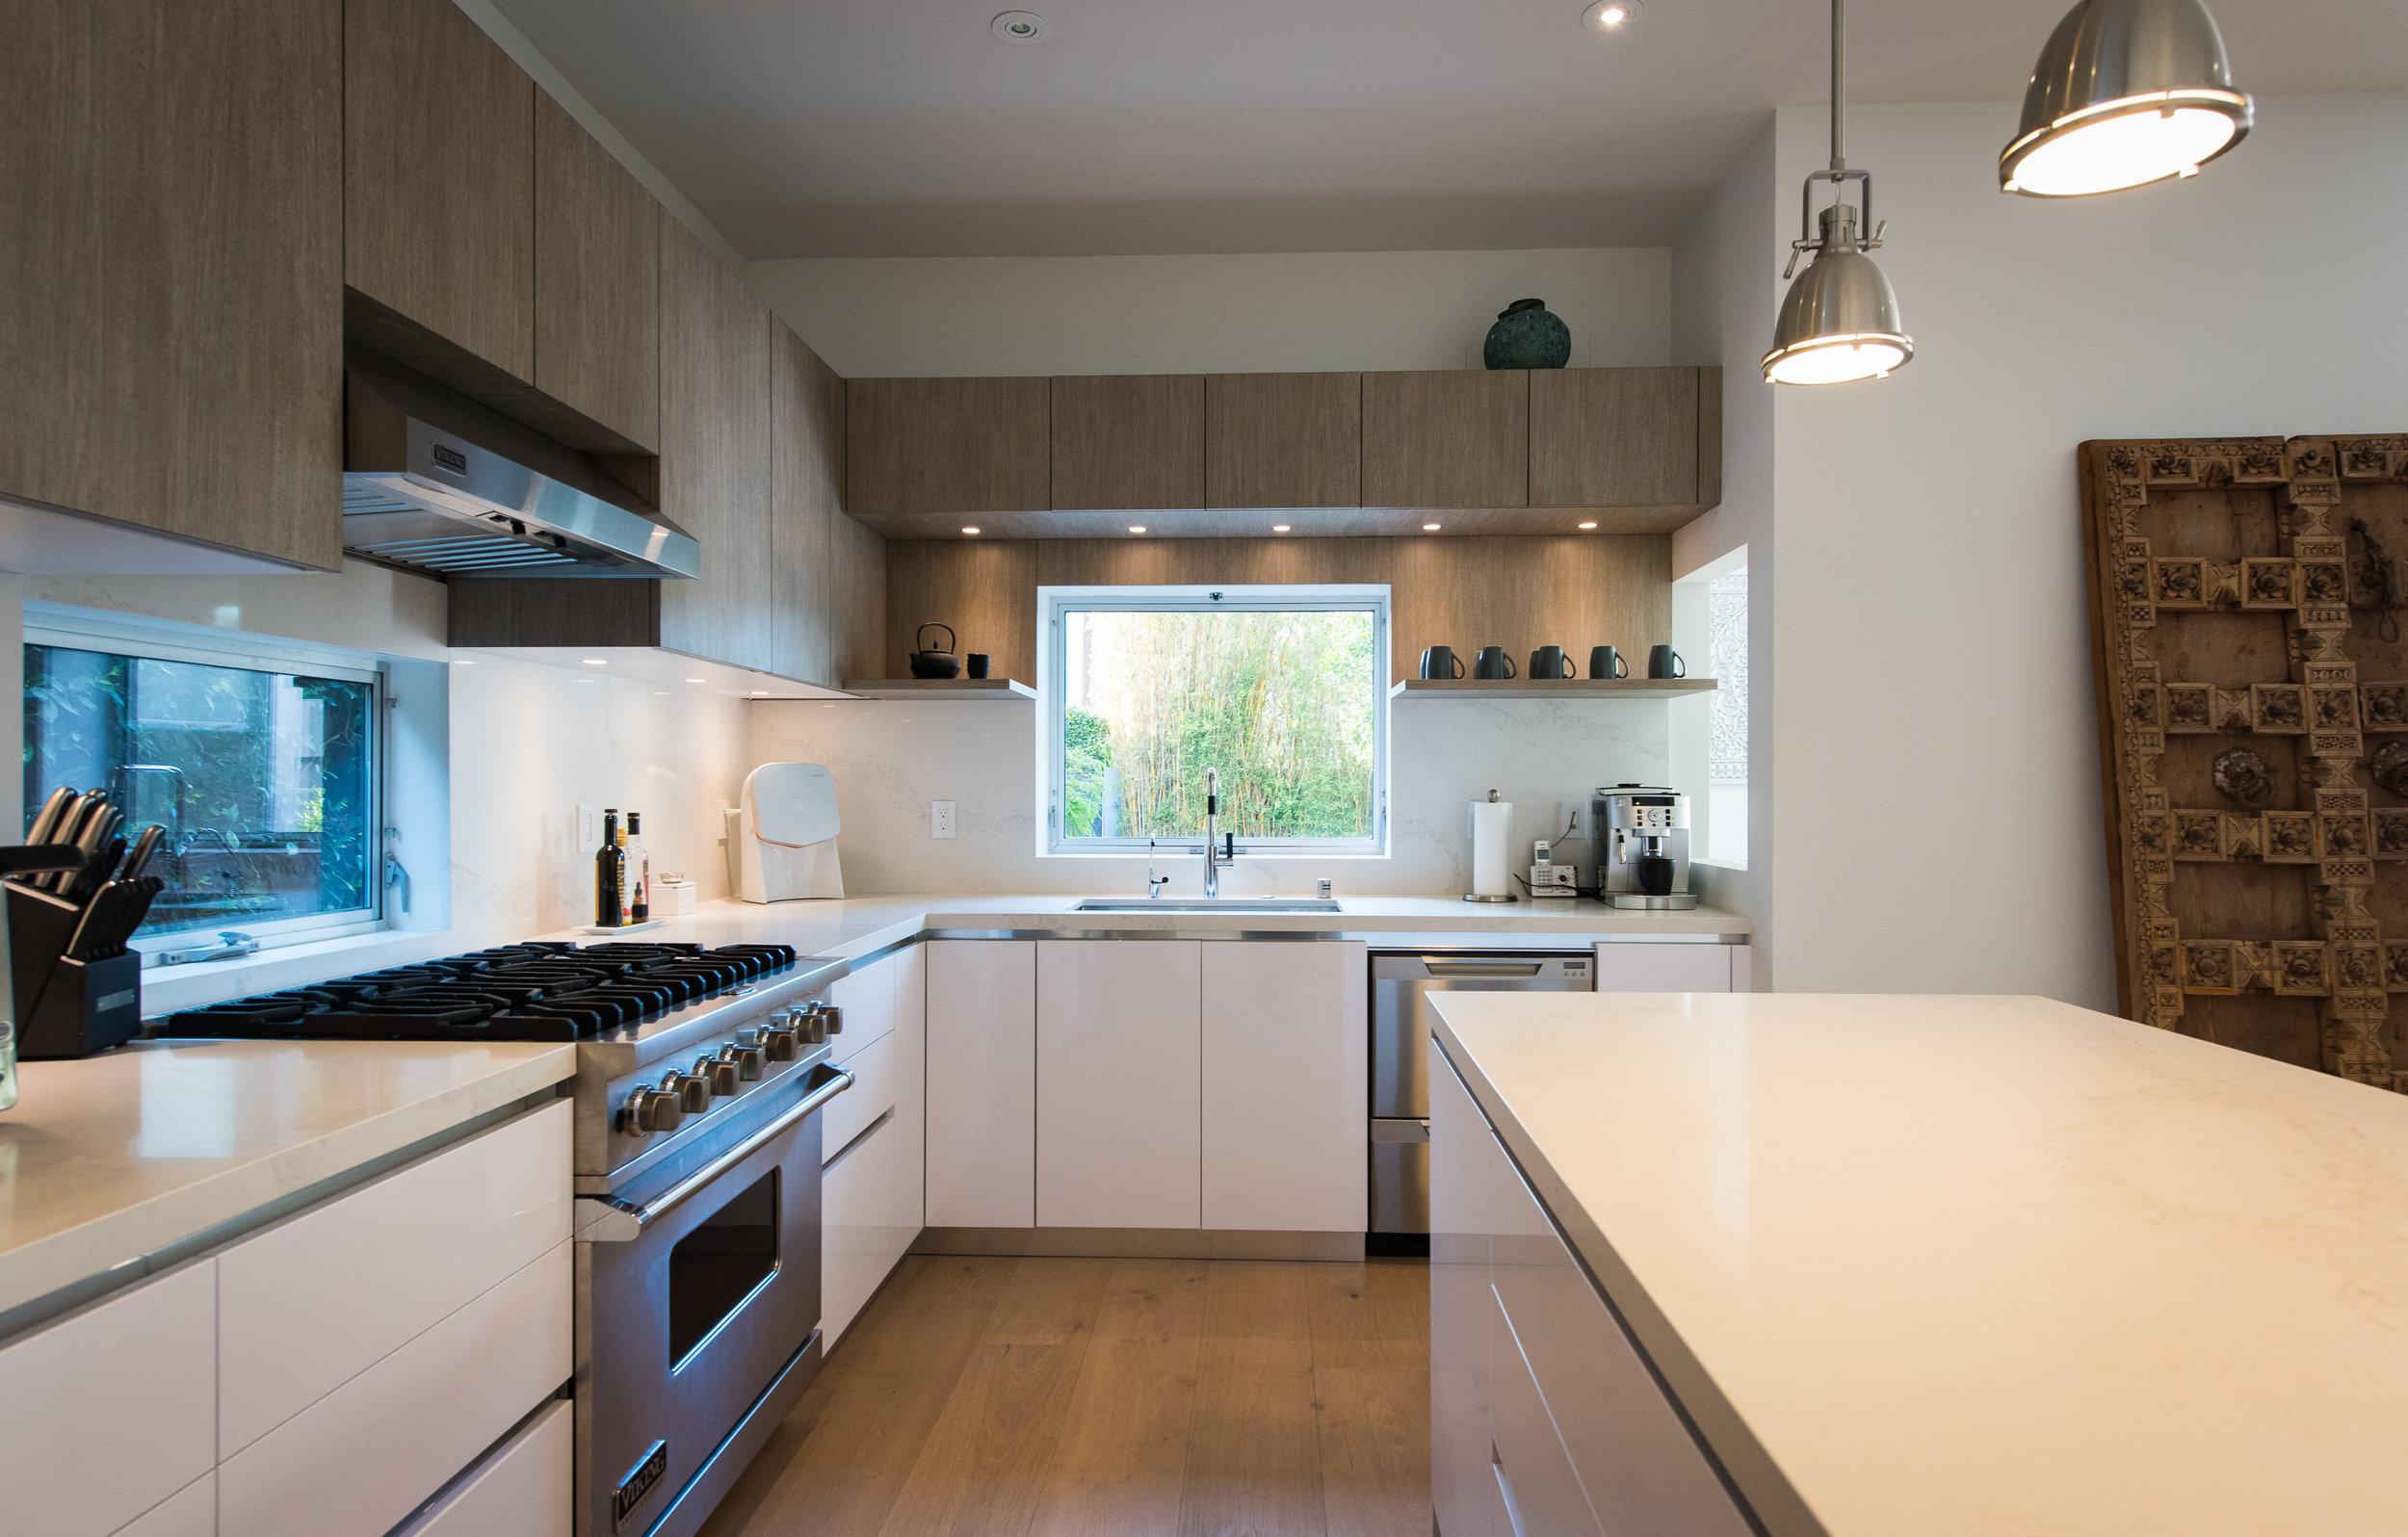 SANTA_CLARA_kitchen.jpg